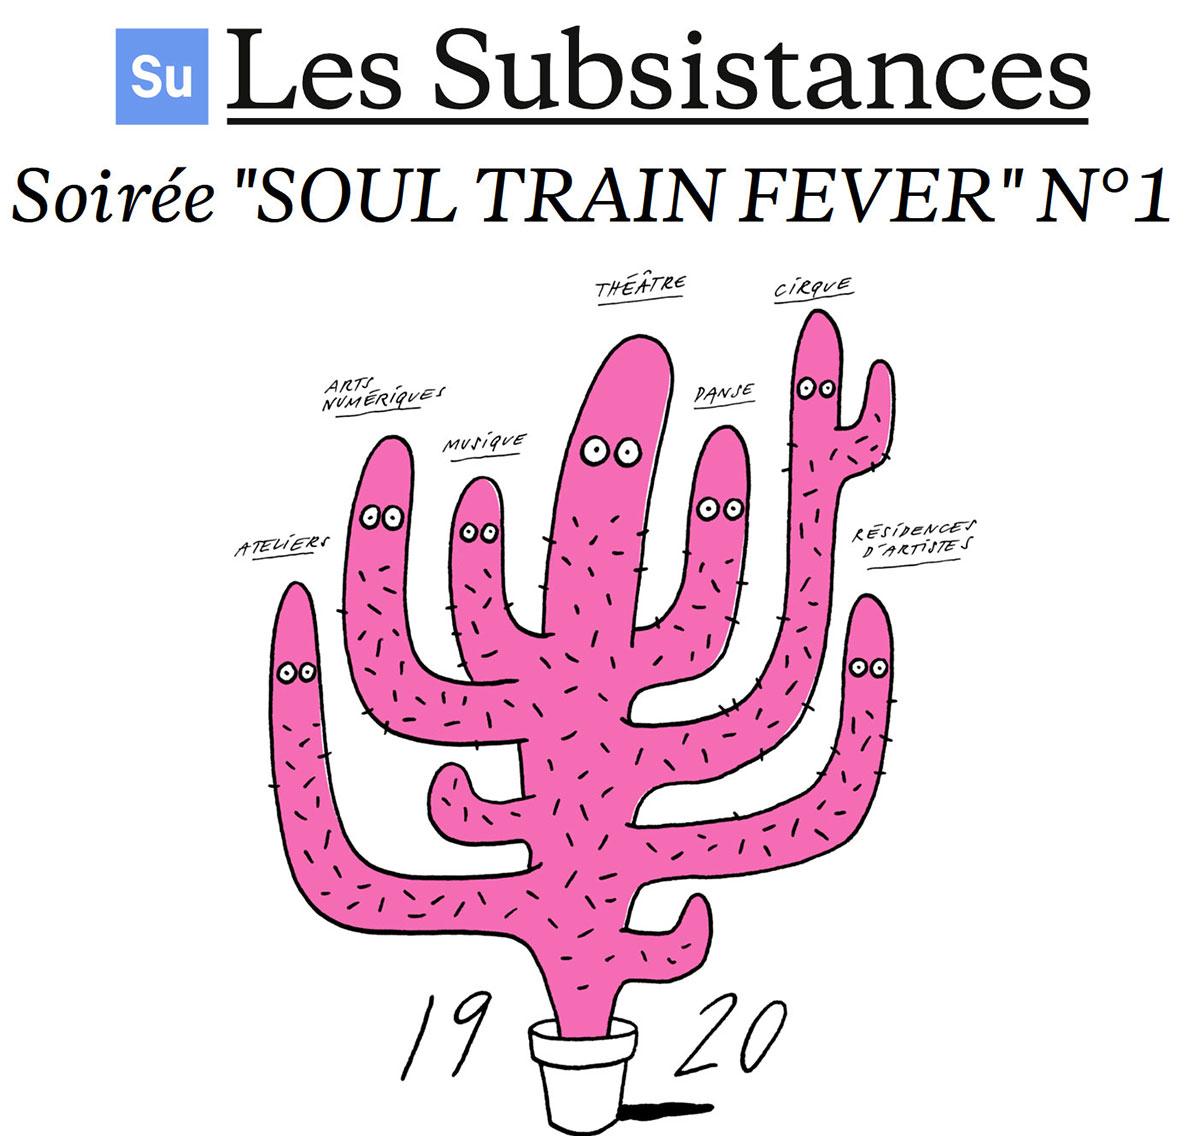 Soiree-soul-train-fever-2019_subsistances-cie-stylistik_1200.jpg